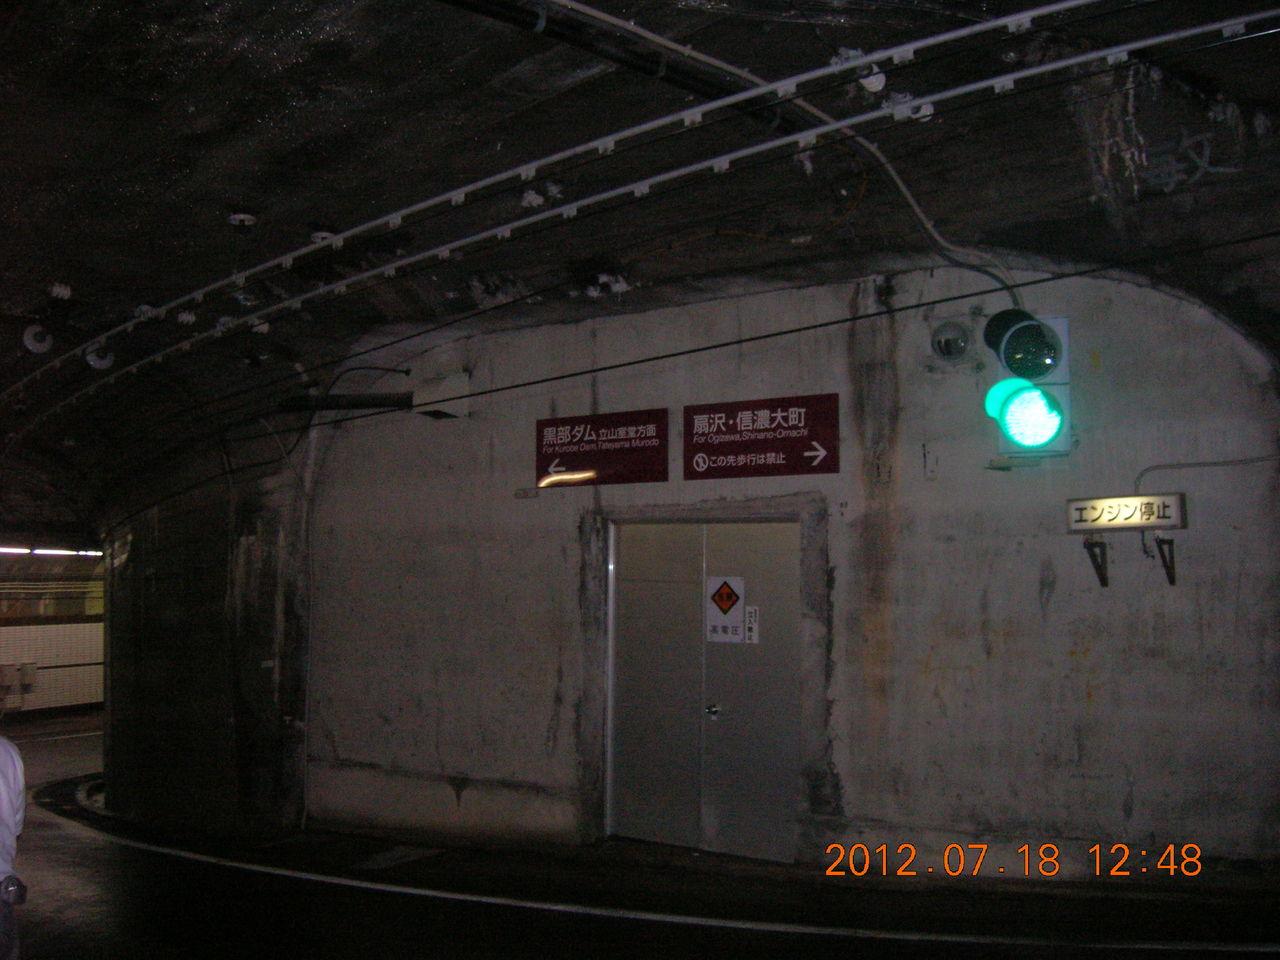 DSCN2640 黒部トンネル内上部末端は関電トンネルトロリーバスの黒部ダム駅裏側旋回部分...